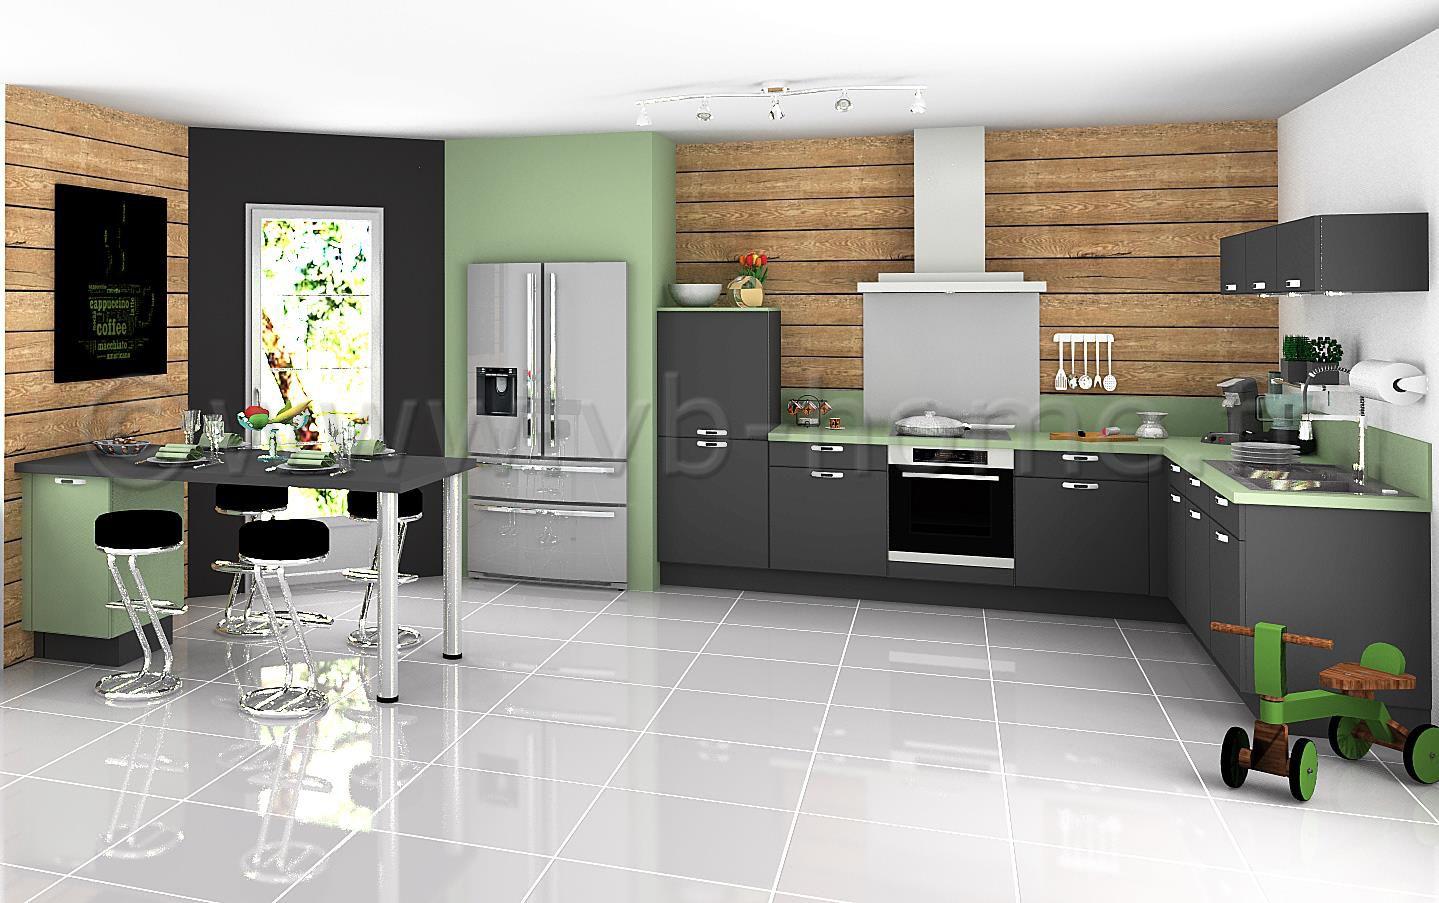 Grande cuisine ouverte moderne avec fa ades gris vert - Cuisine vert gris ...